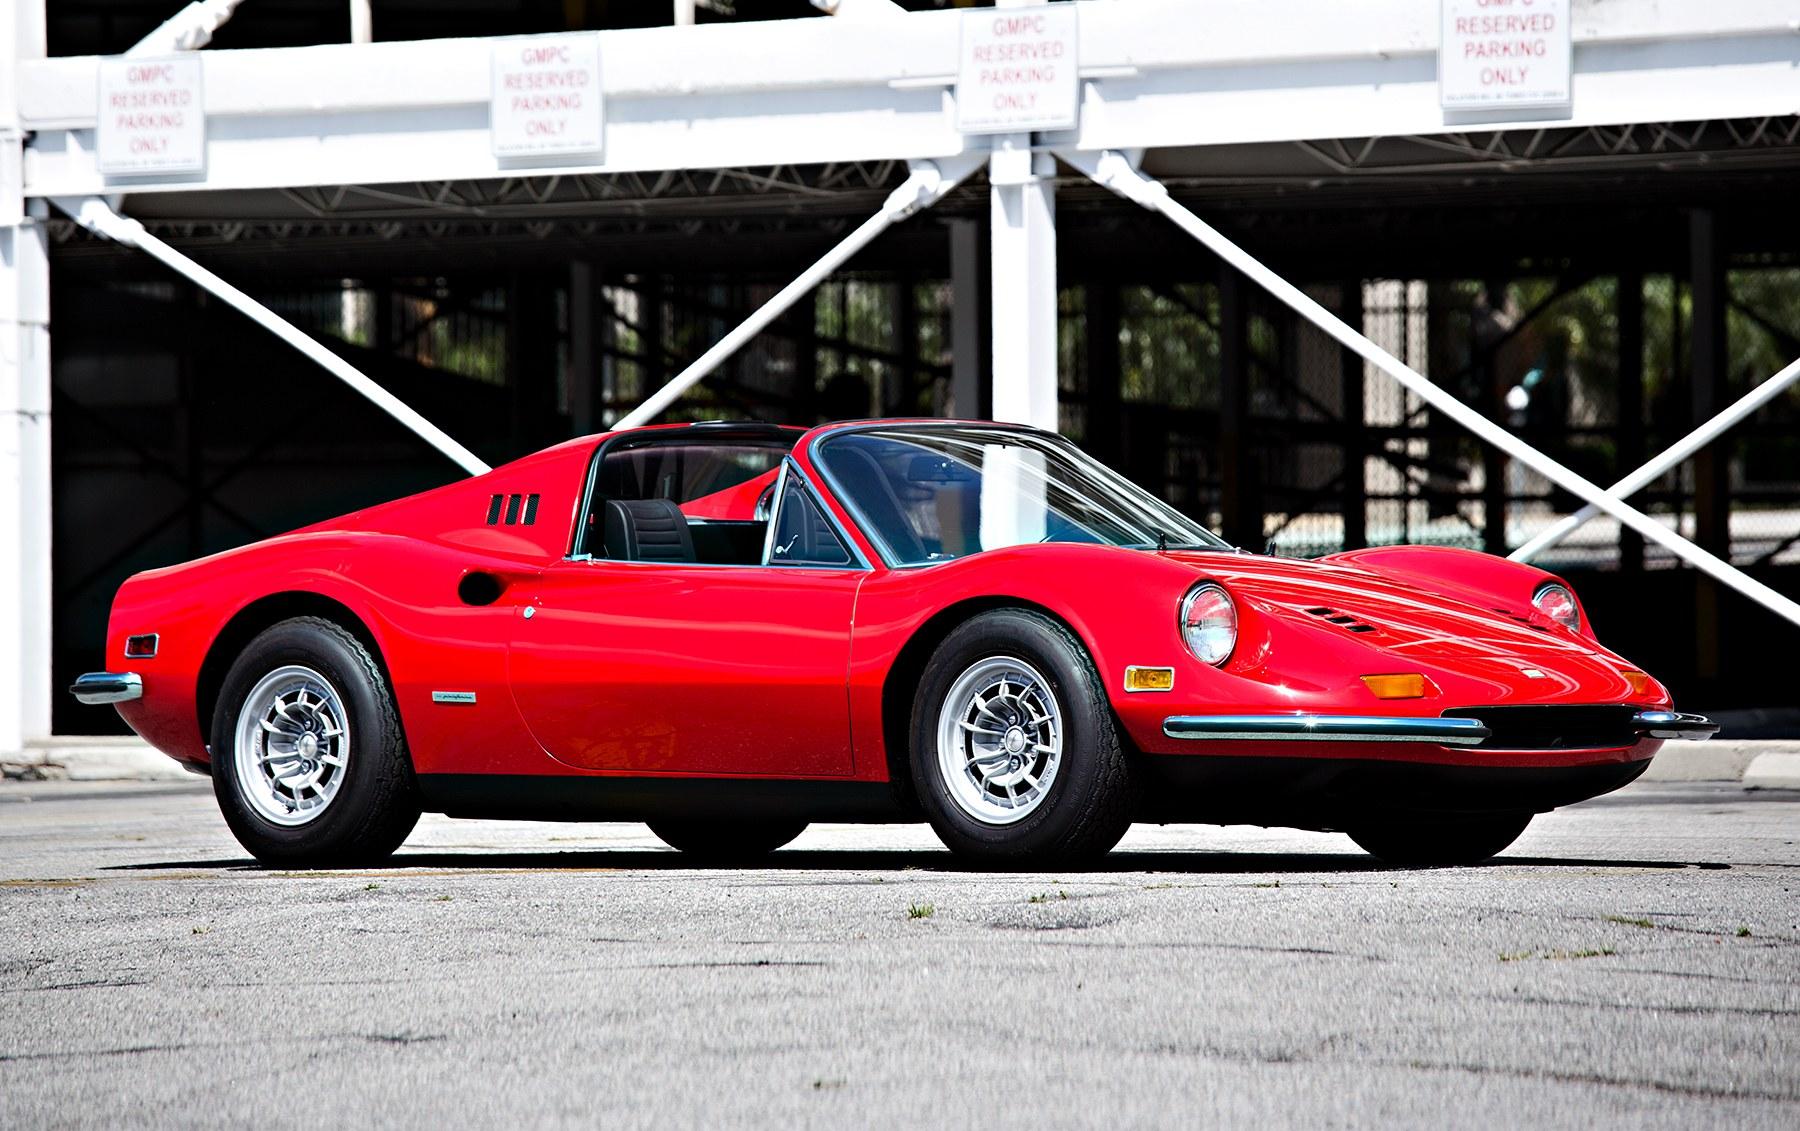 1974 Ferrari Dino 246 GTS-3